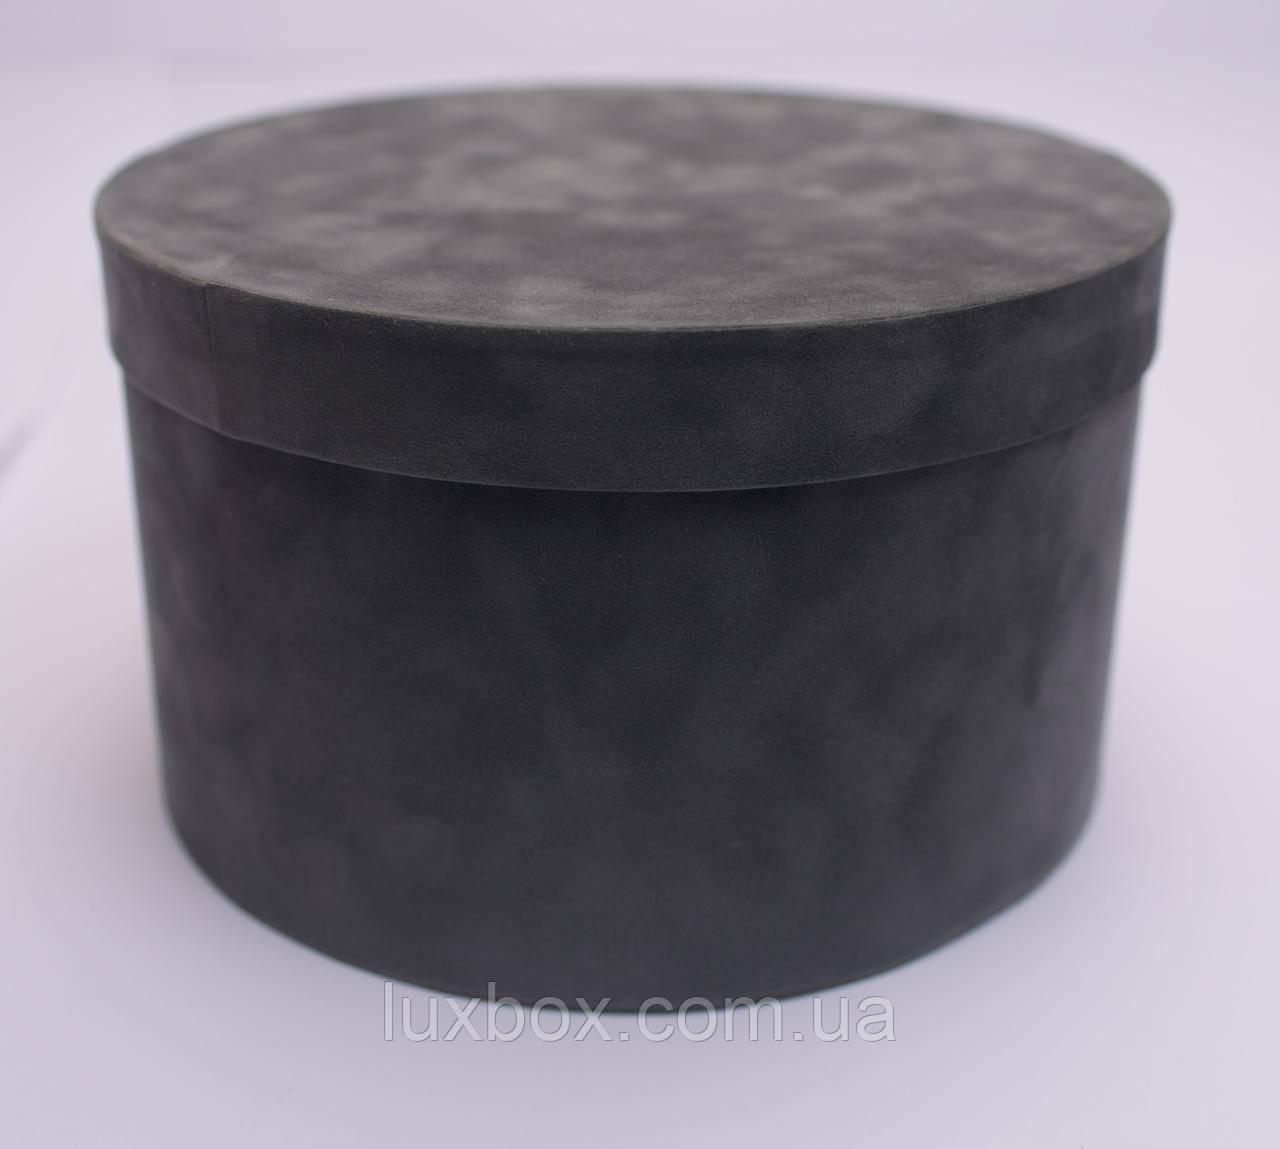 Шляпна коробка Велюрова(бархатна коробка) h13/d22